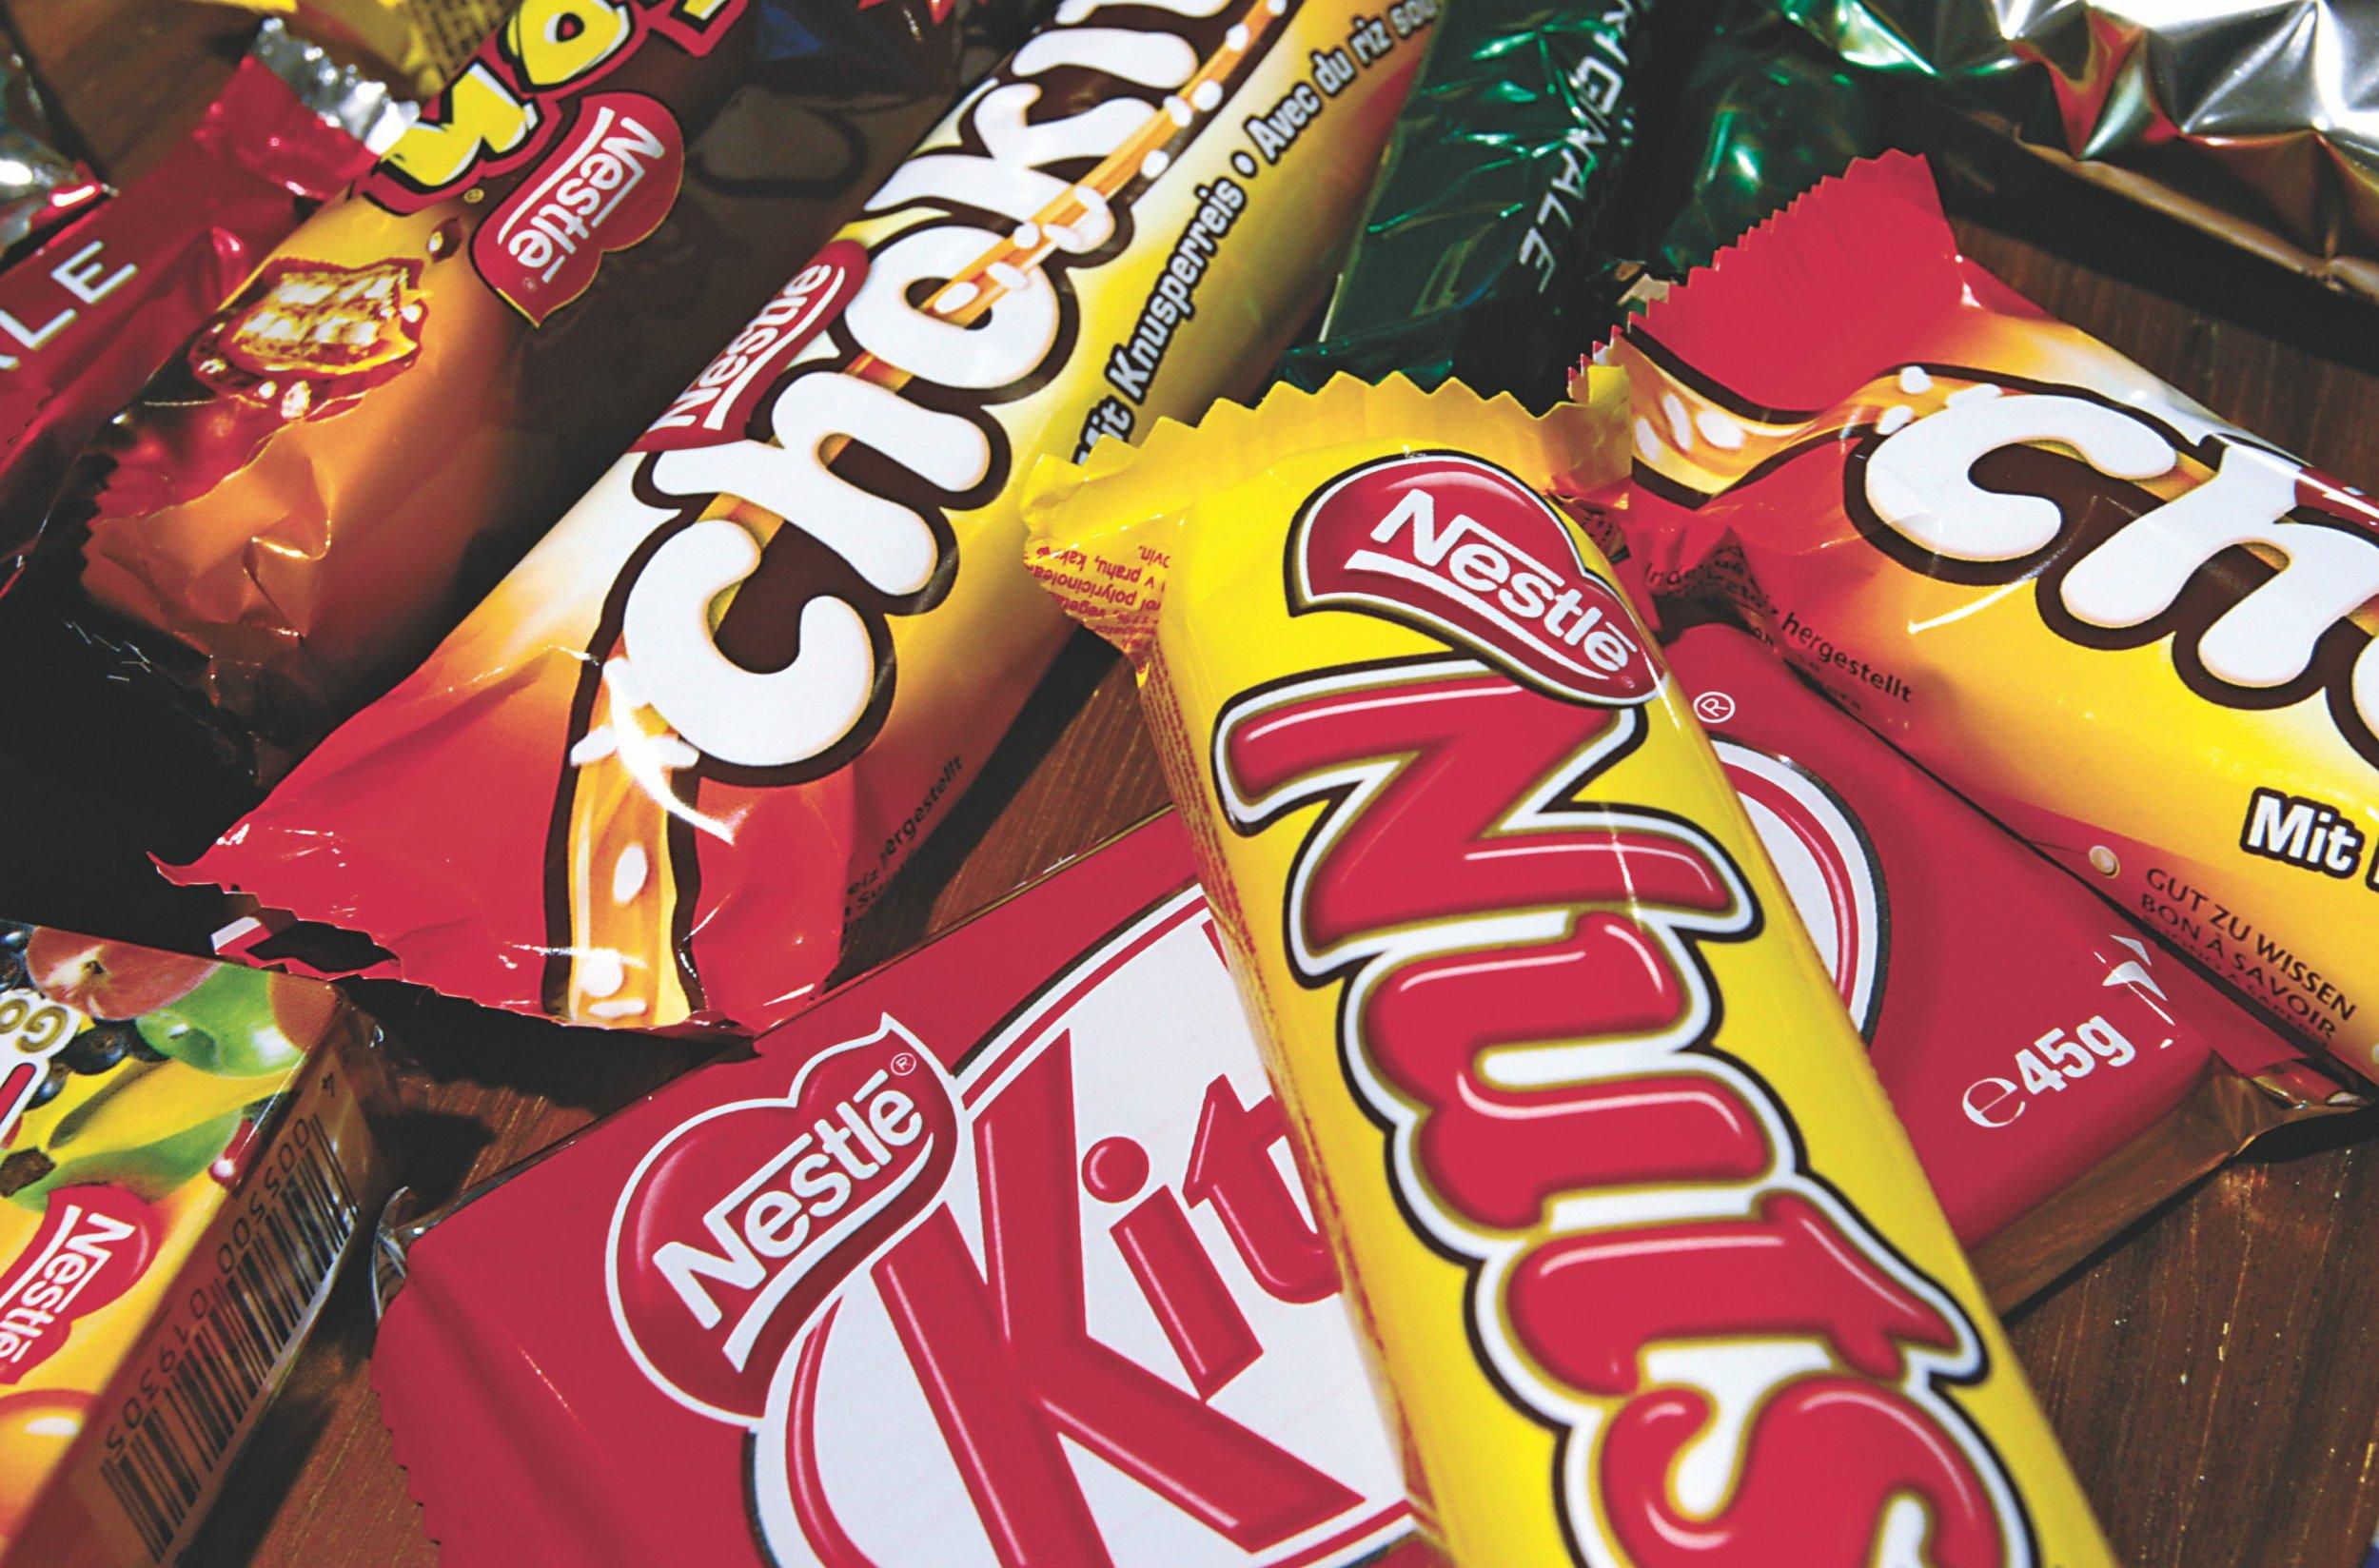 McCardle-nm0122-Chocolate-tease